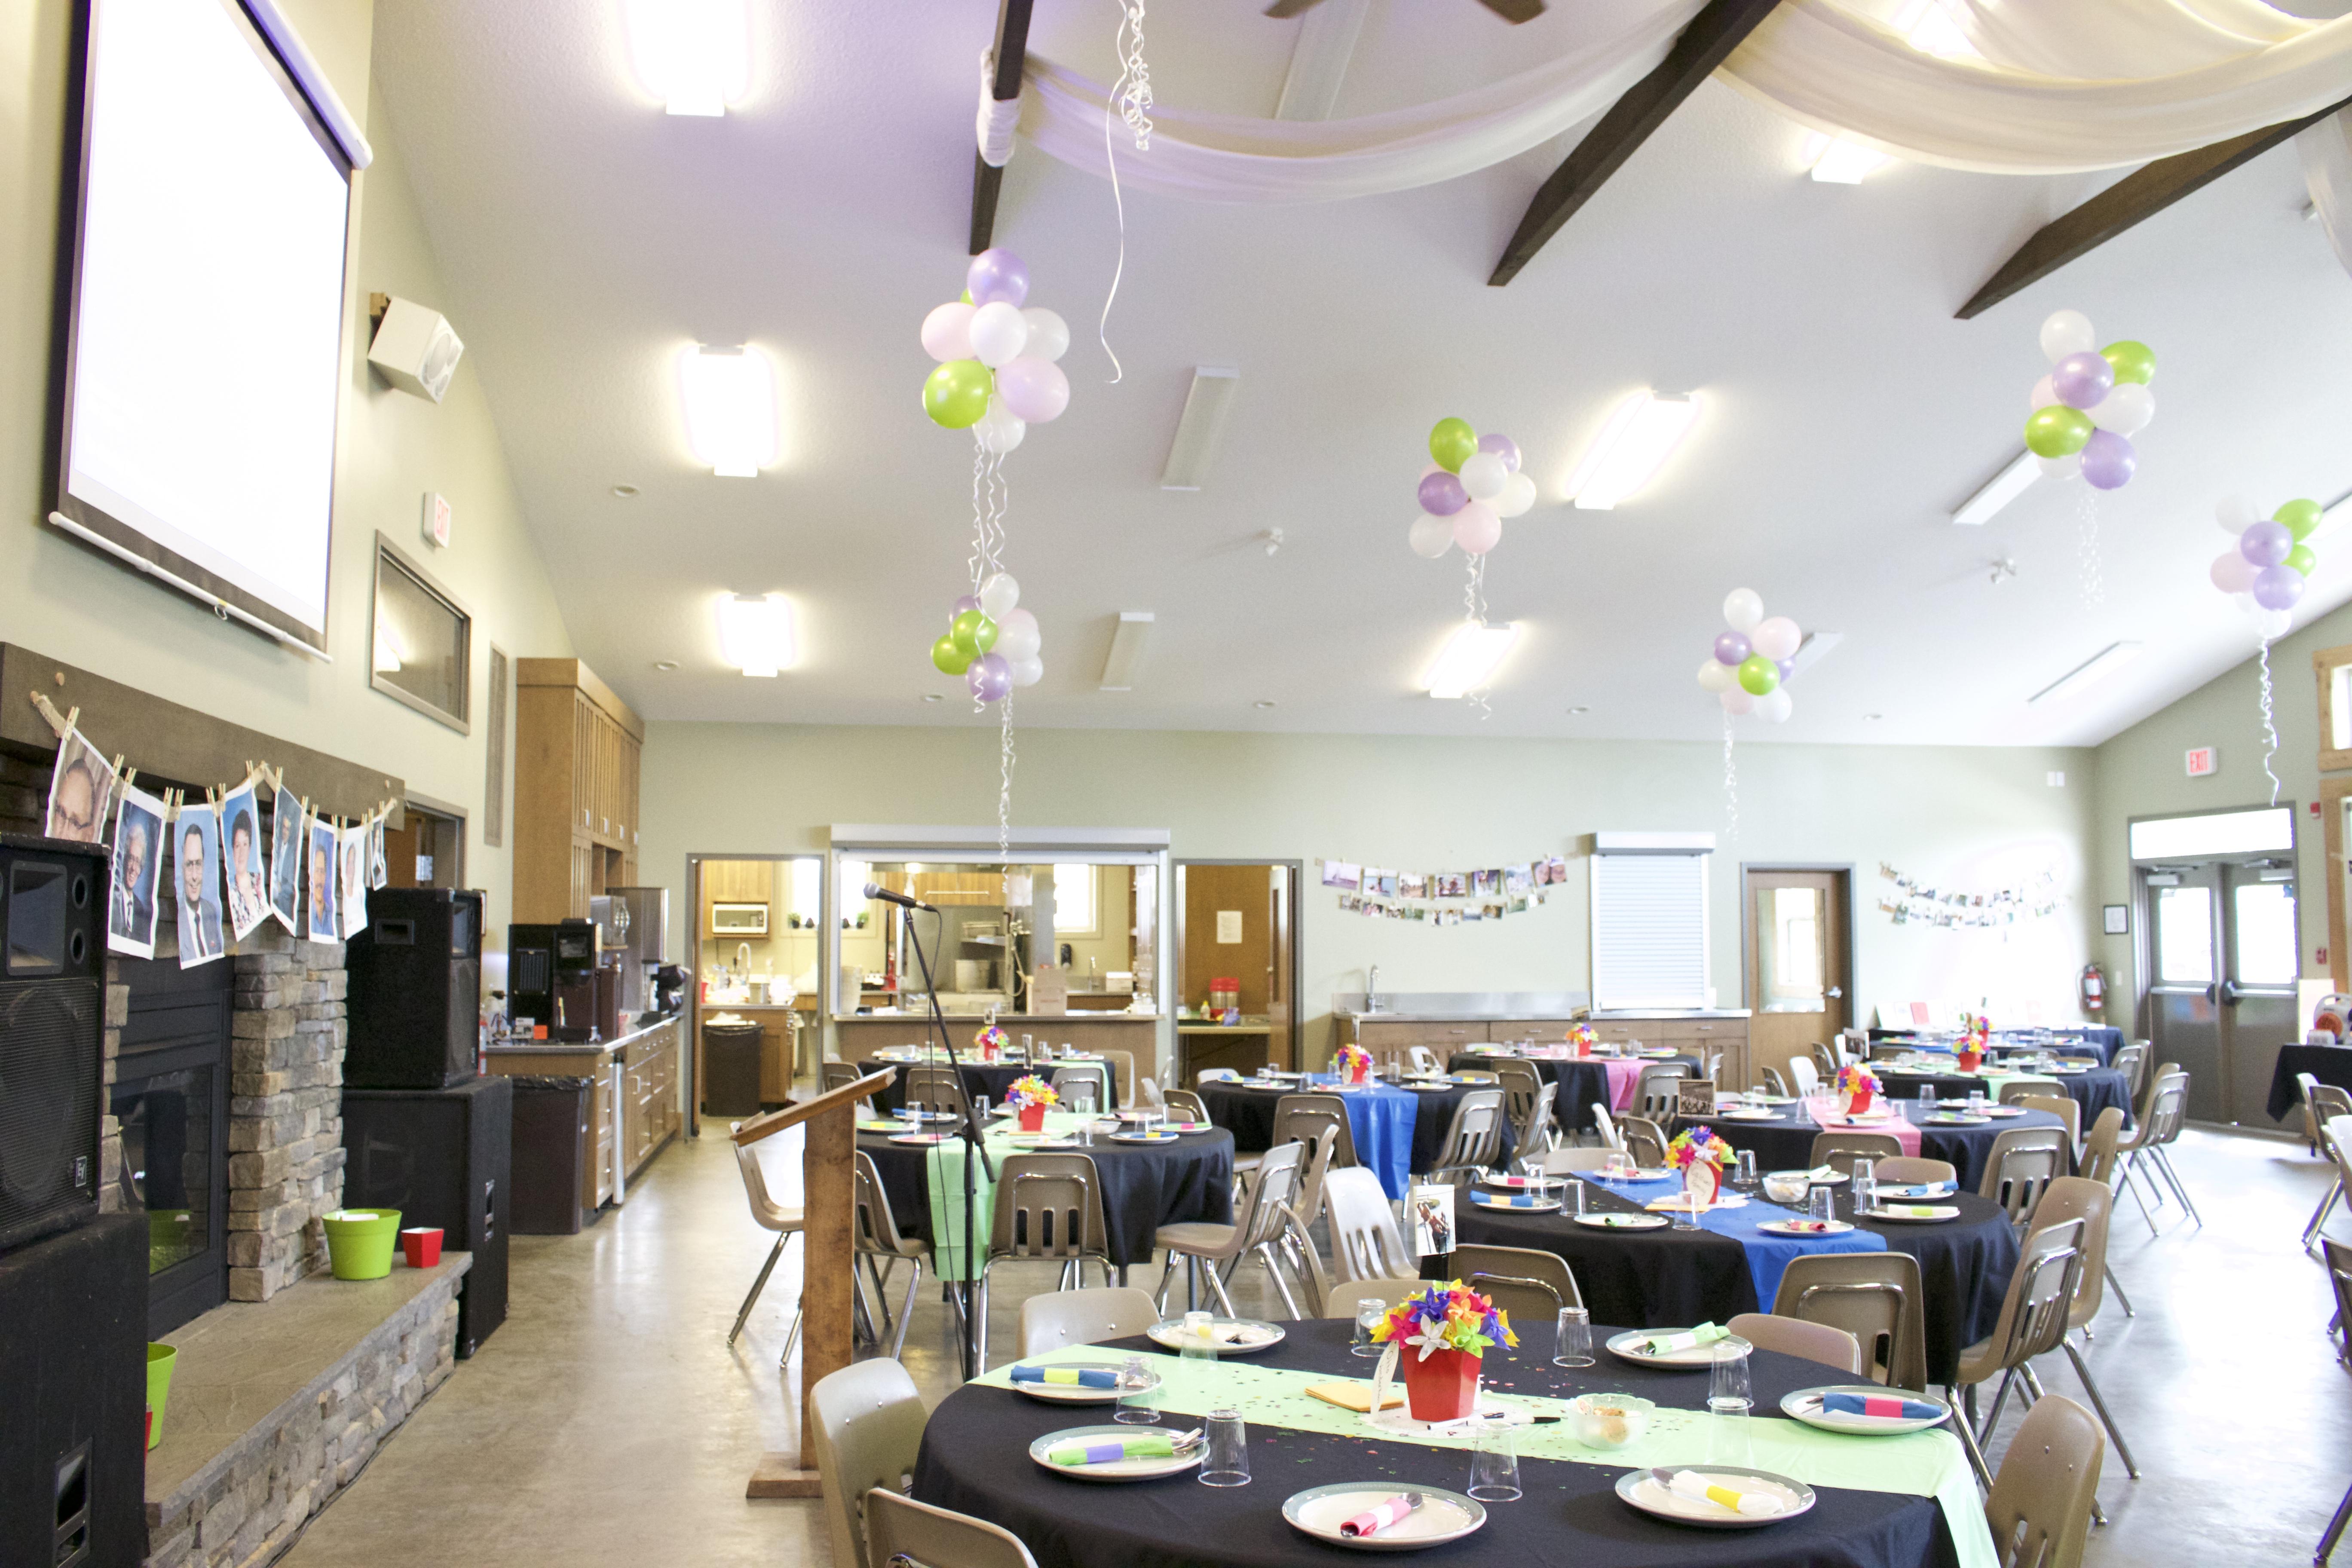 Lodge Dining Hall